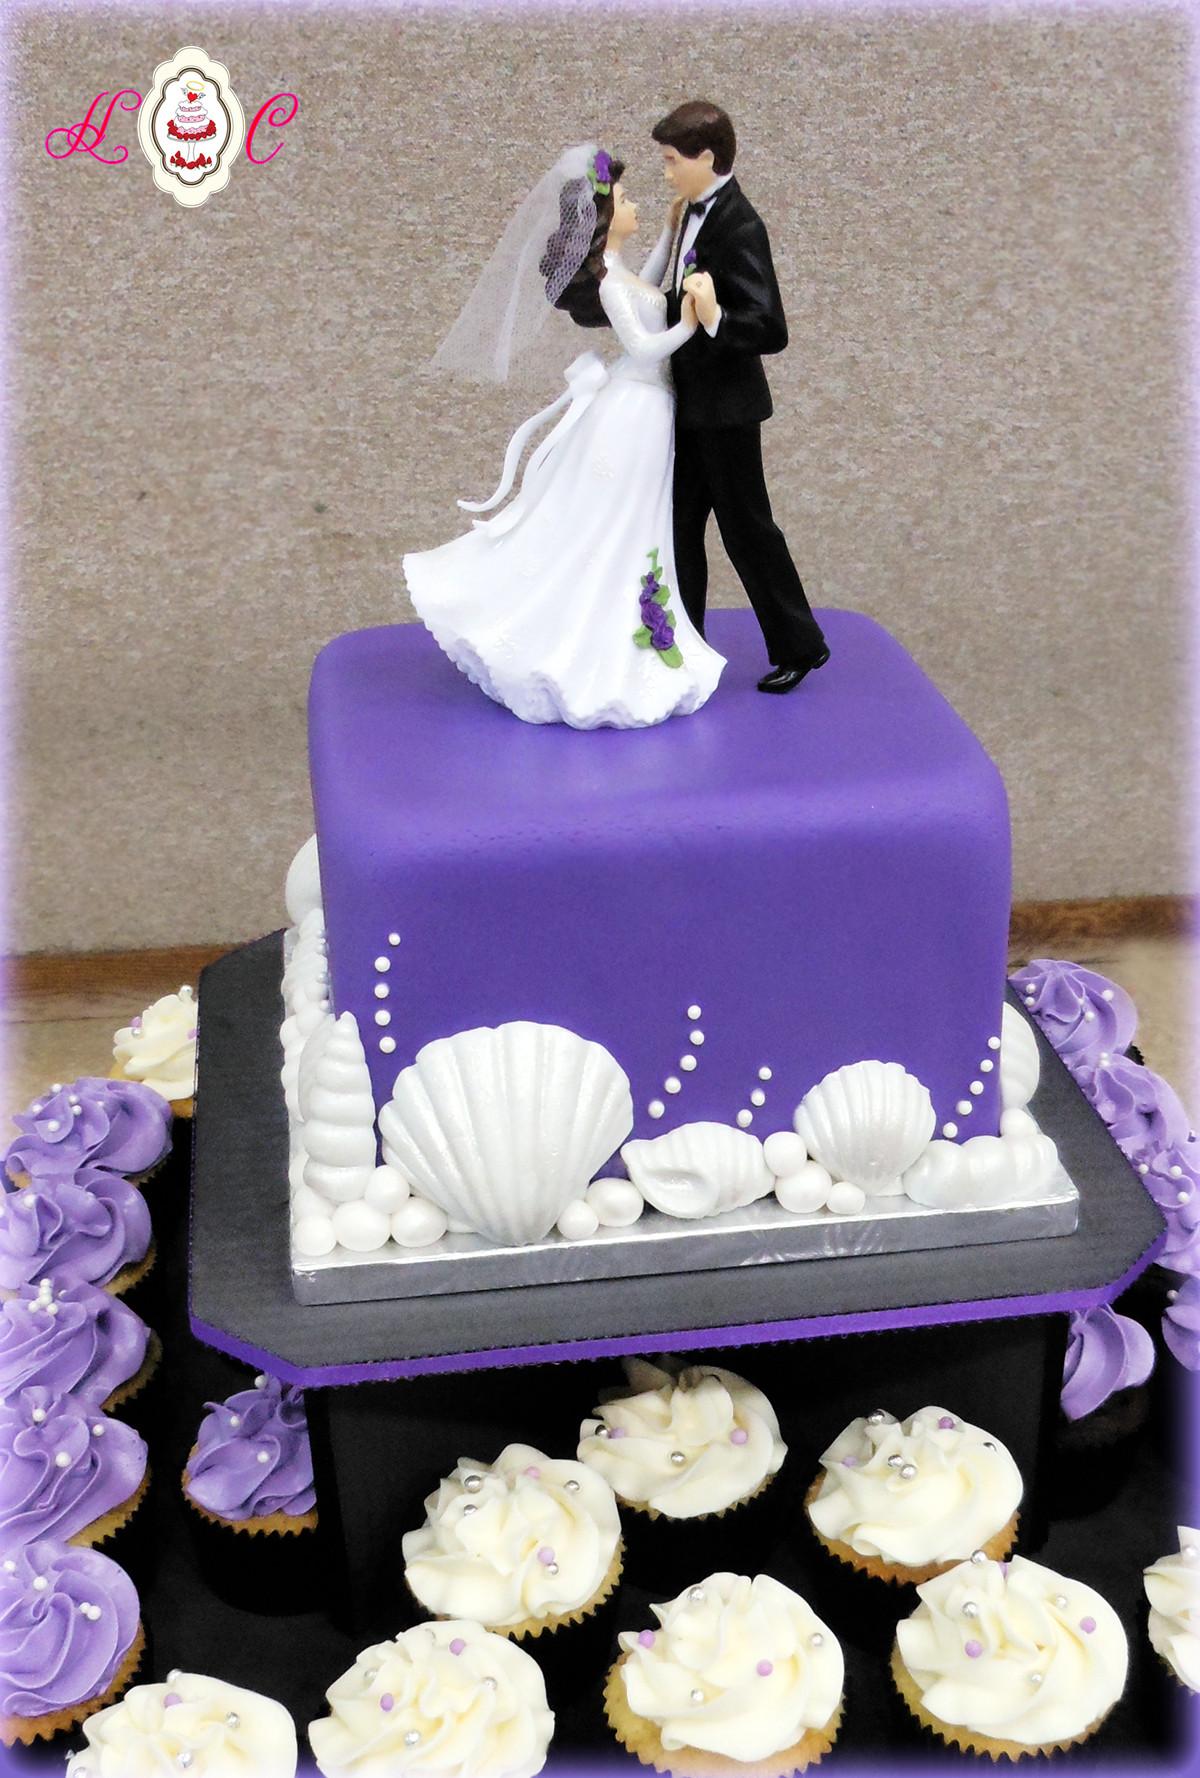 Purple Wedding Cakes Pictures  Wedding Cakes in Marietta Parkersburg & More Heavenly